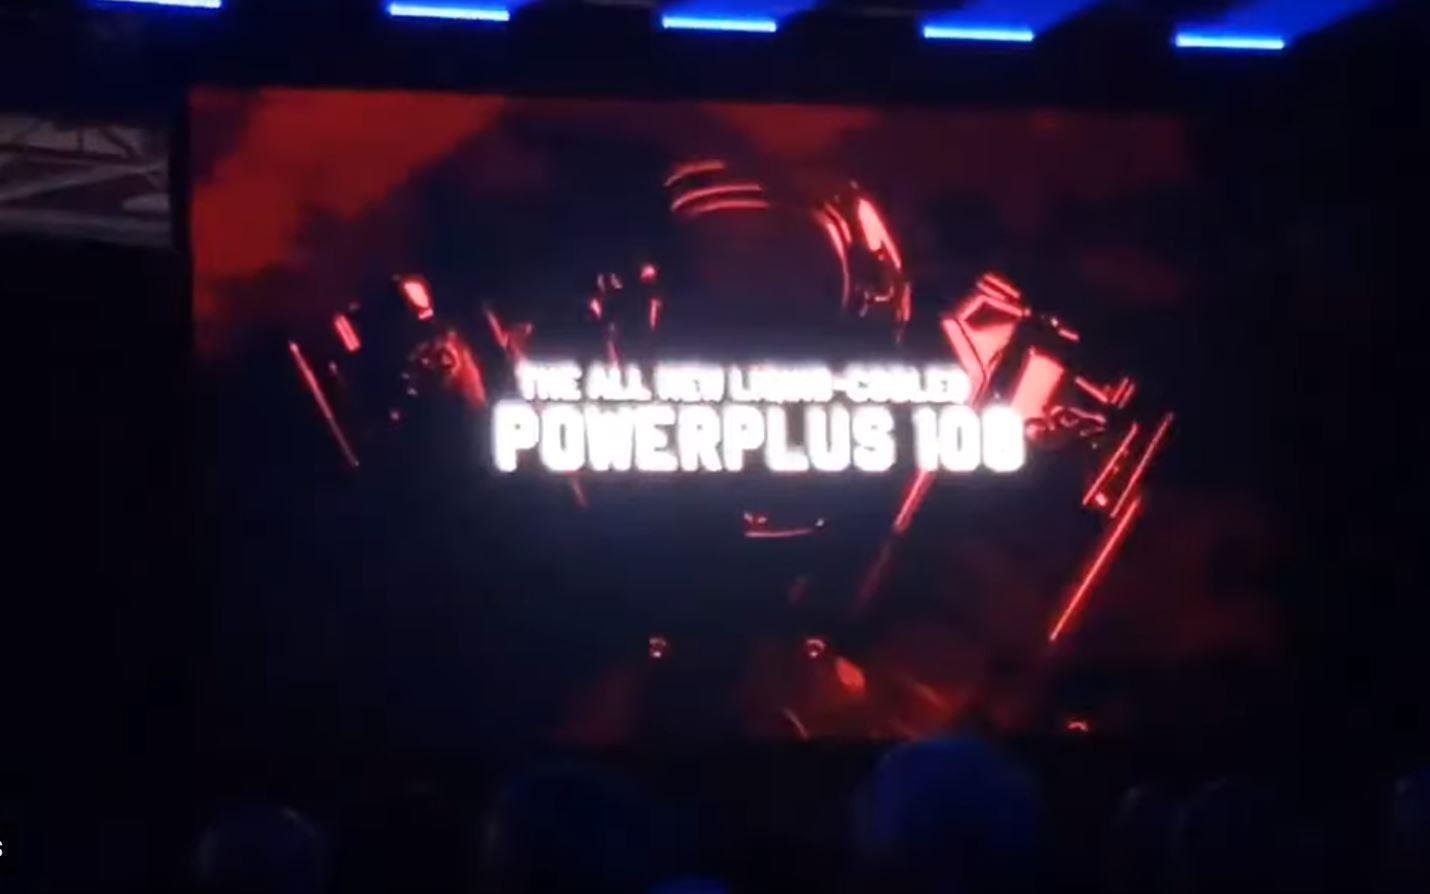 Powerplus 108 engine